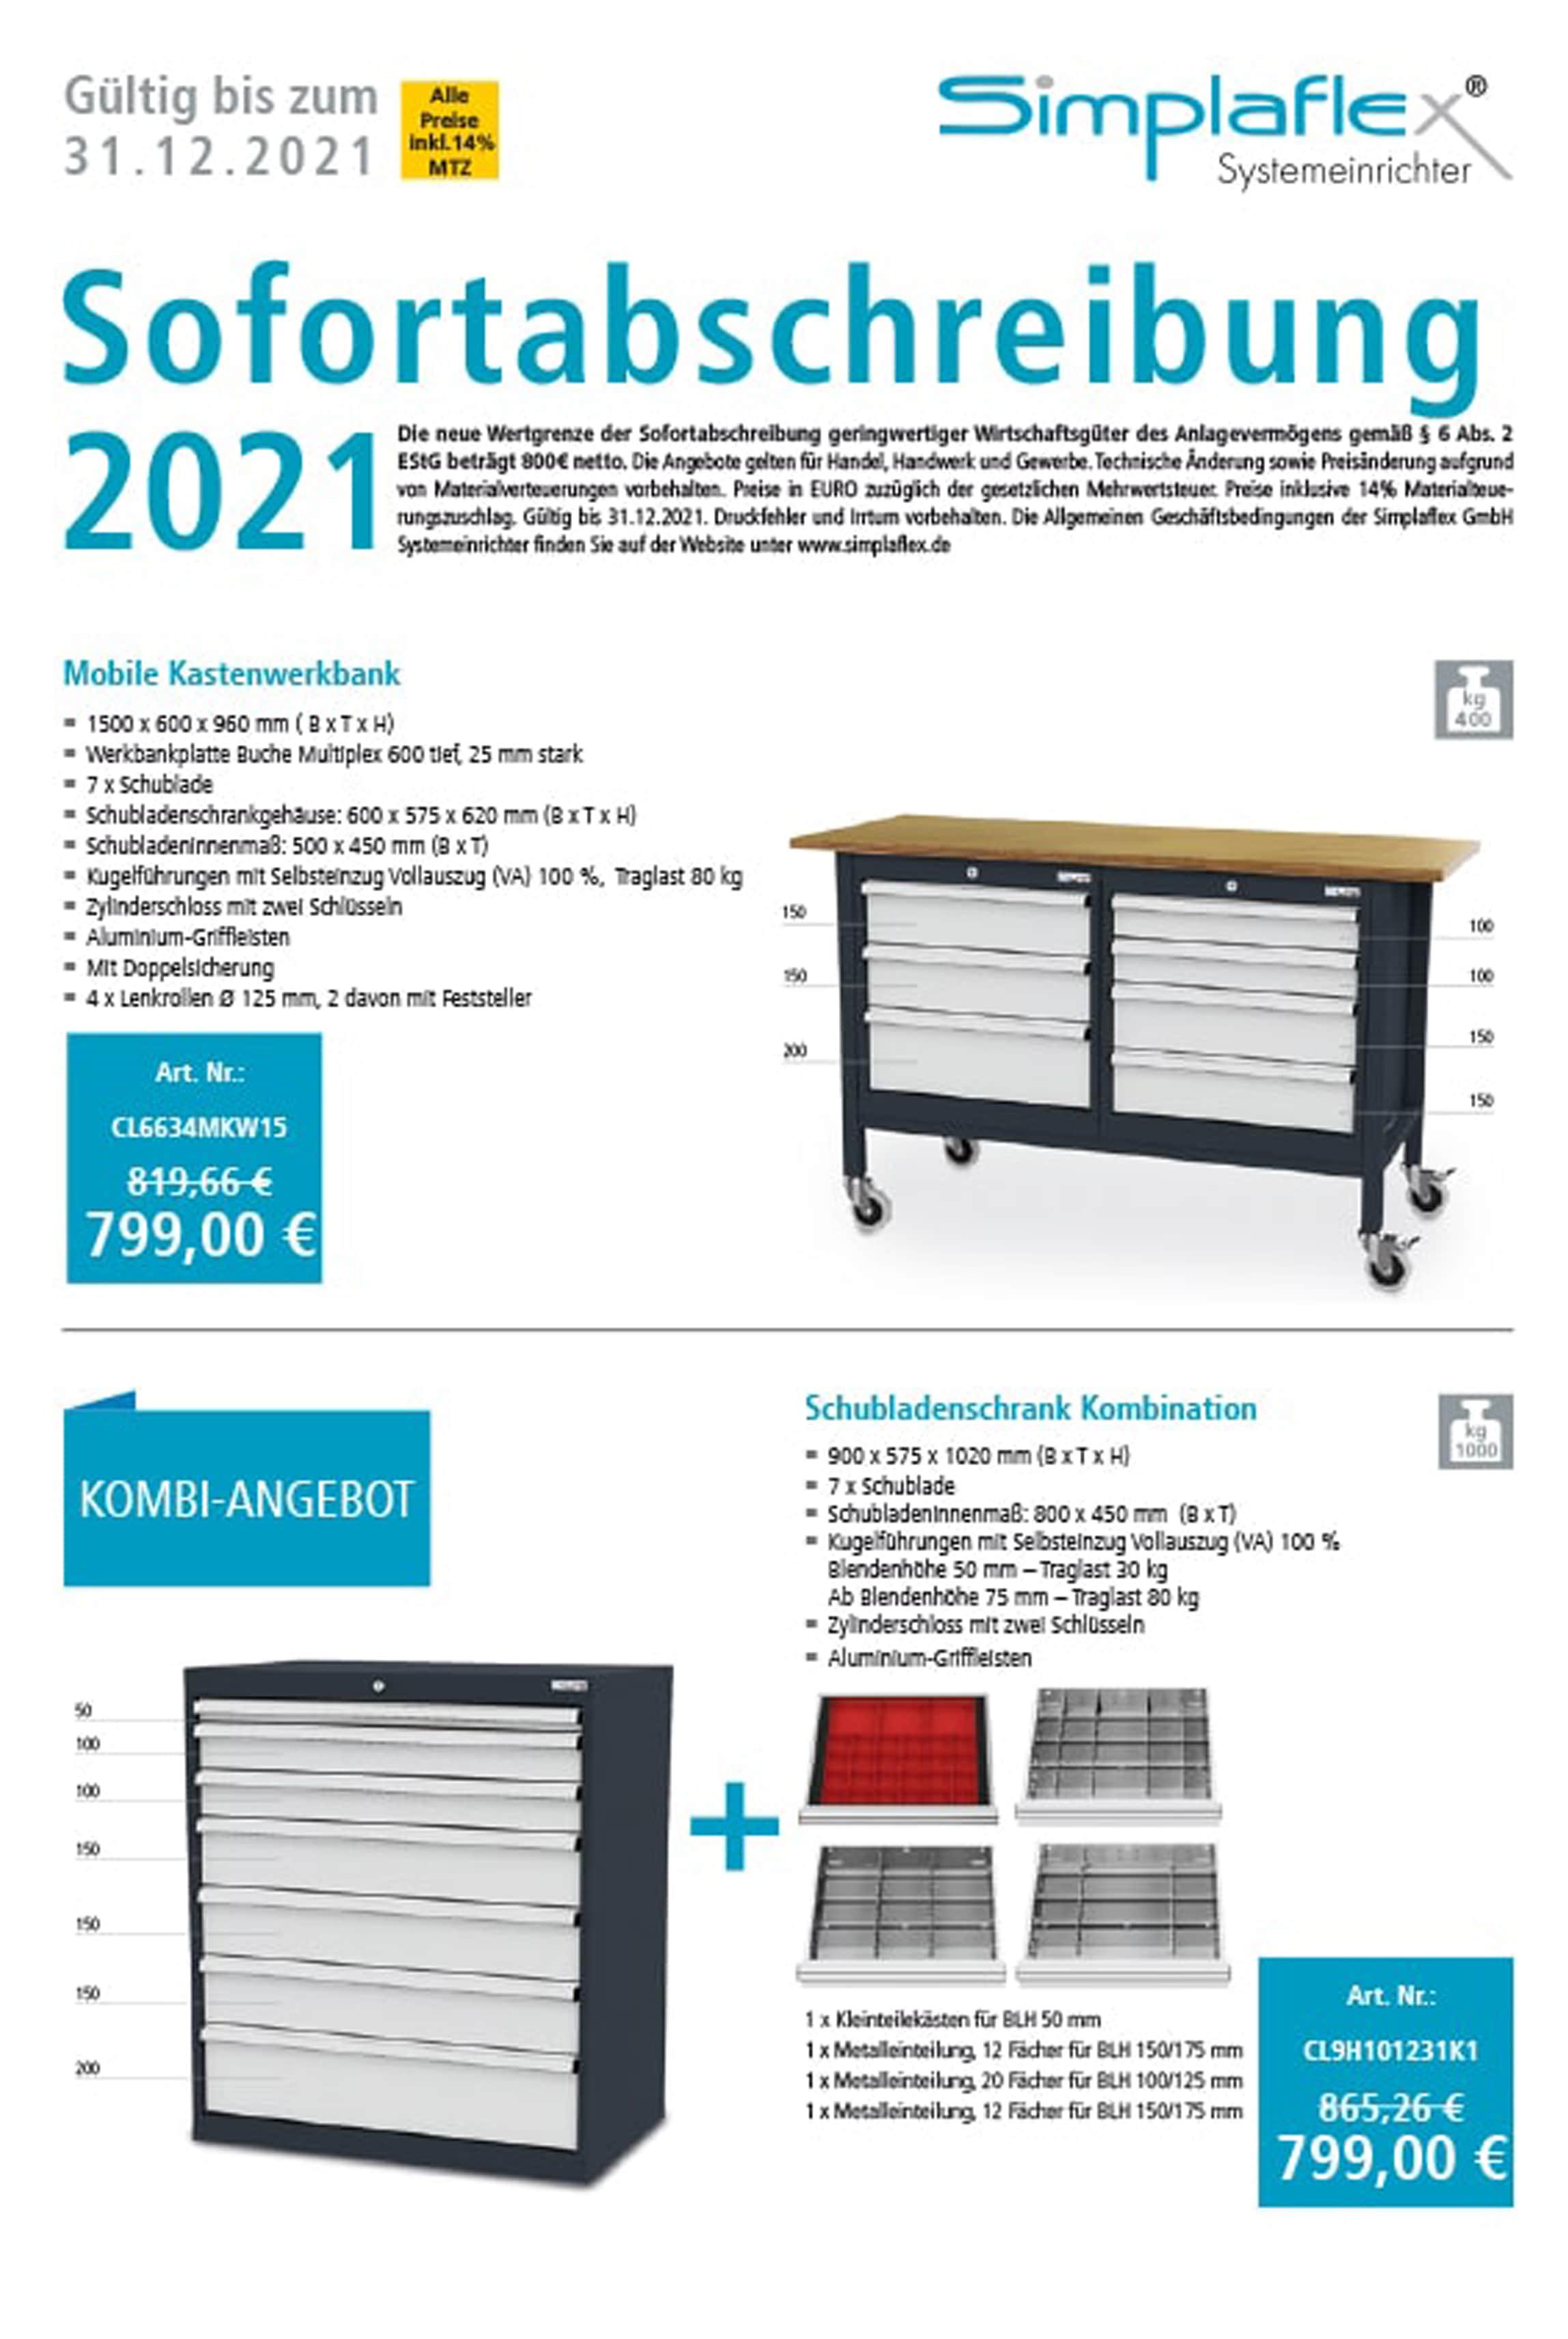 Simplaflex-ABSCHREIBUNG 2021